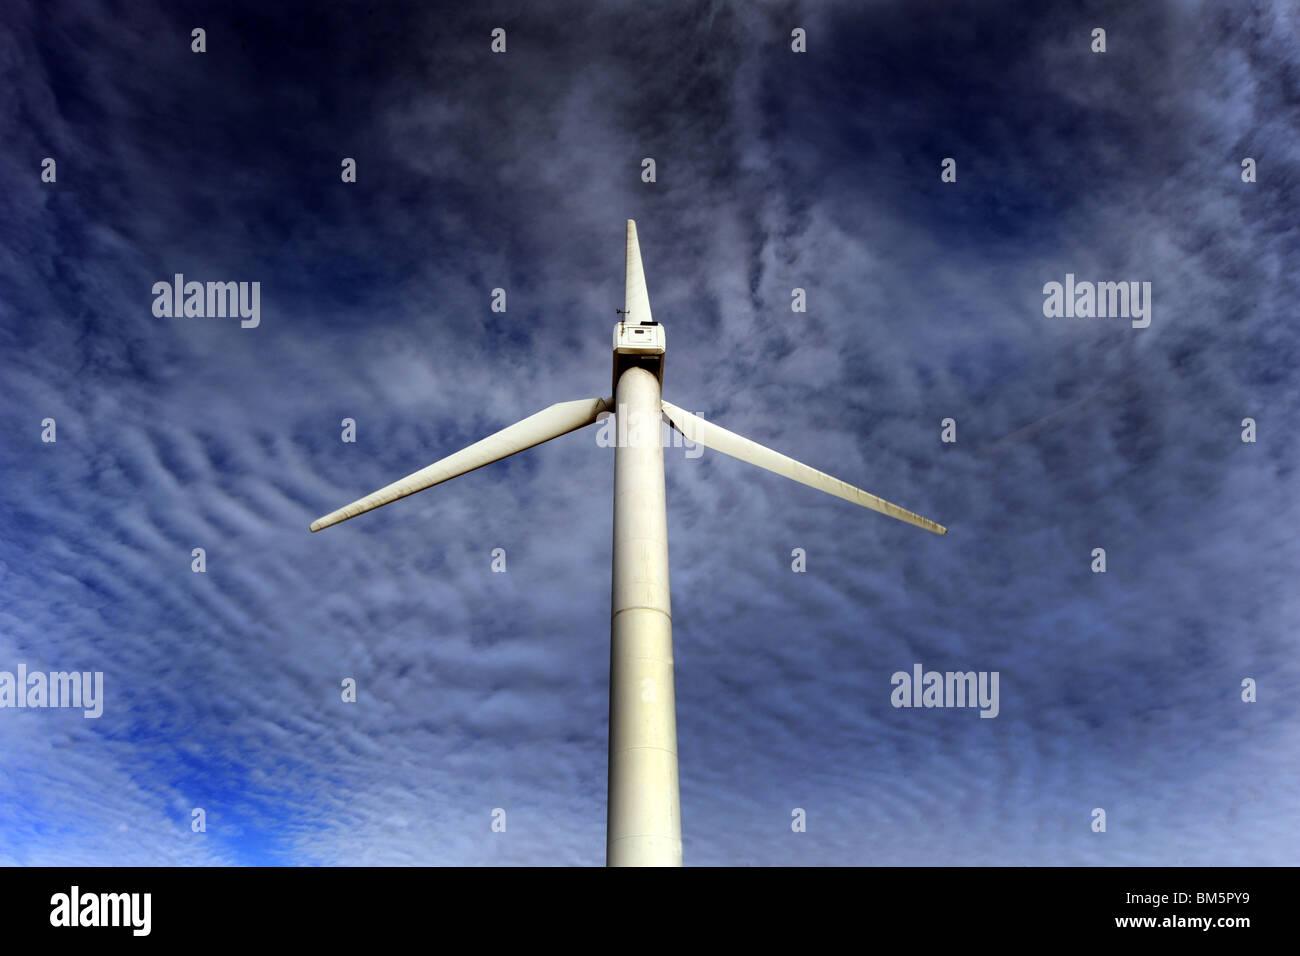 Windfarm turbine against a dramatic blue sky - Stock Image